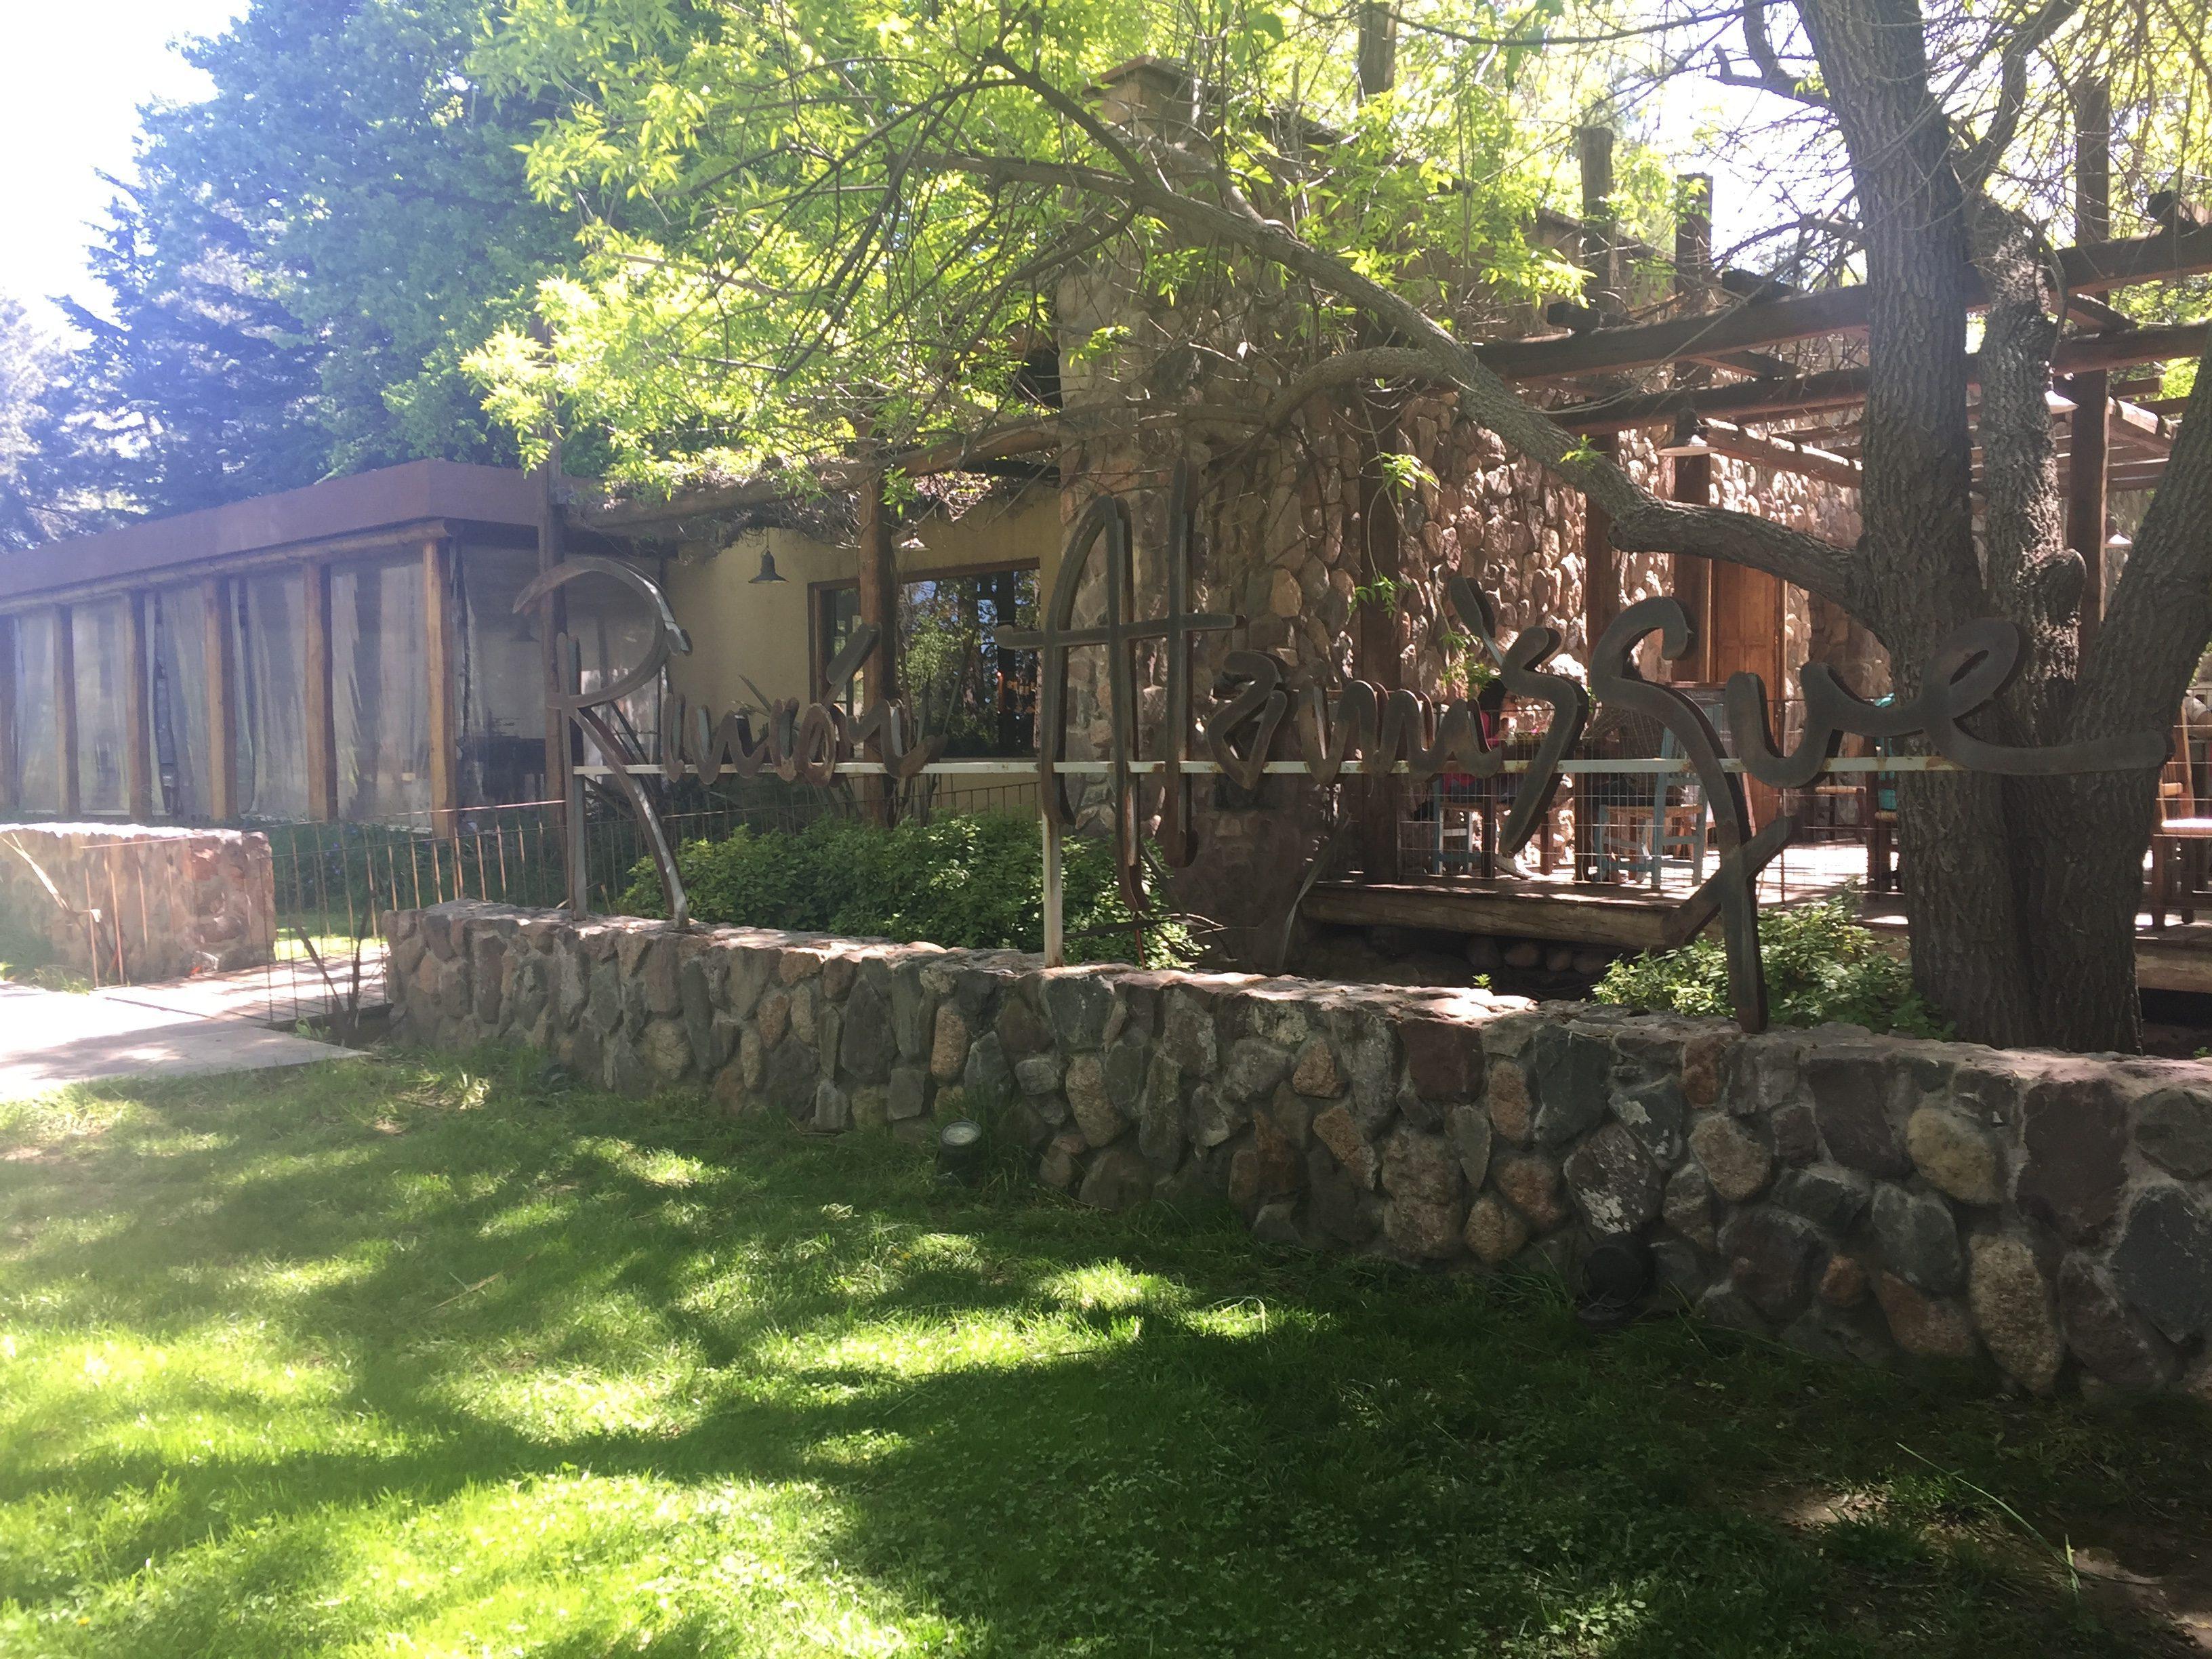 IMG 8409 e1508807748594 - Almorzando en la Bodega Atamisque de Mendoza